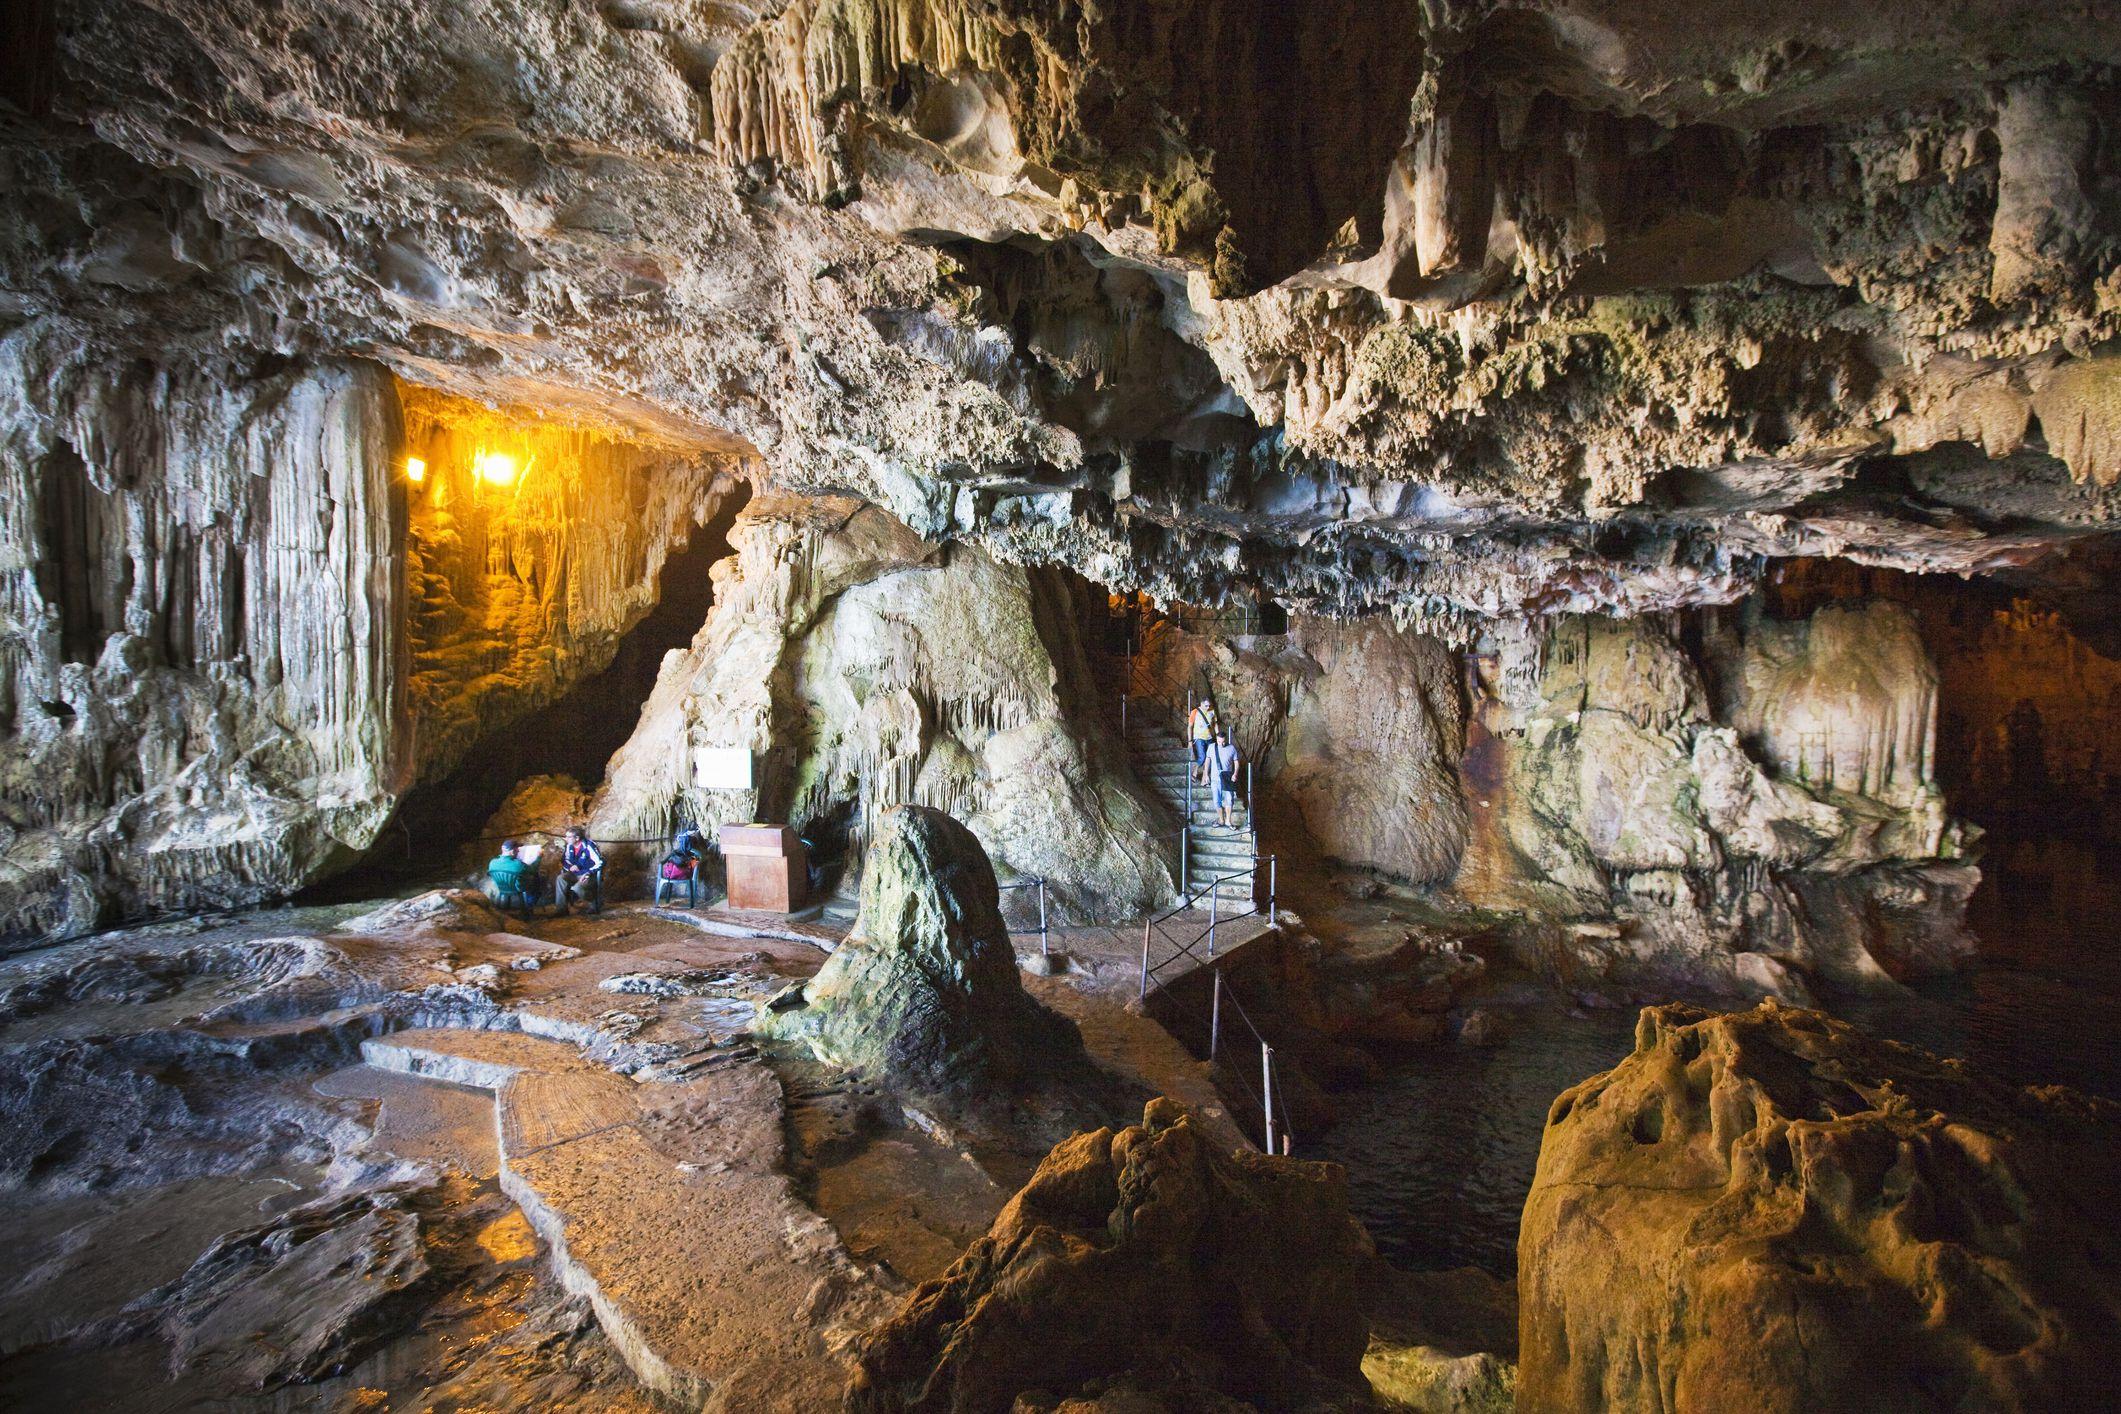 Neptune's Caves